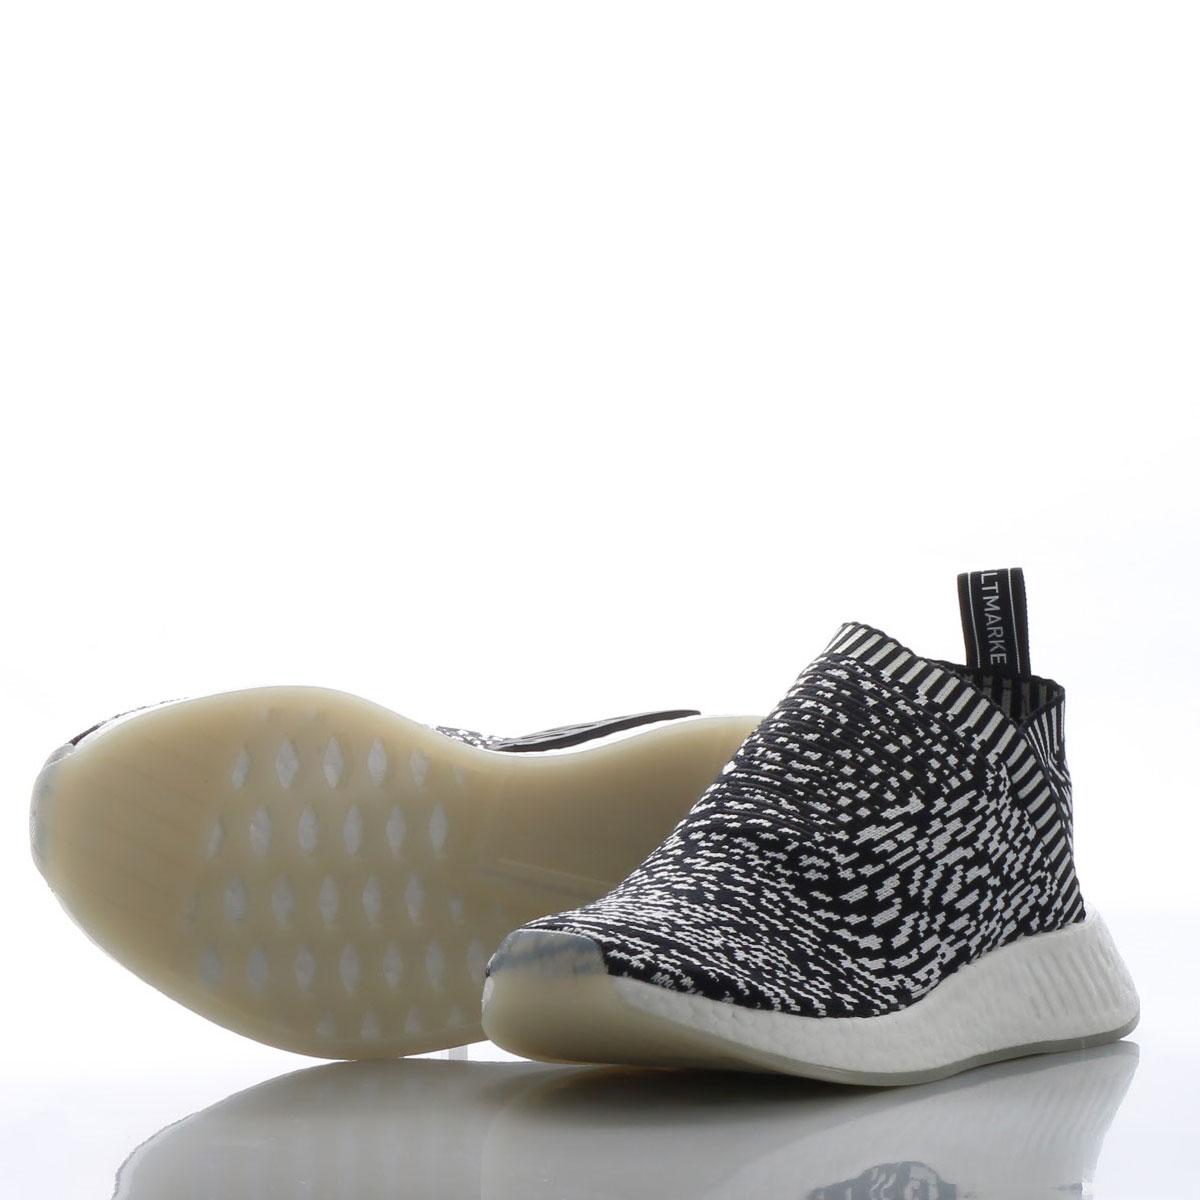 adidas Originals NMD_CS2 PK (アディダス オリジナルス NMD_CS2 PK)Core Black/Core Black/Running White 【メンズ スニーカー】17FW-I